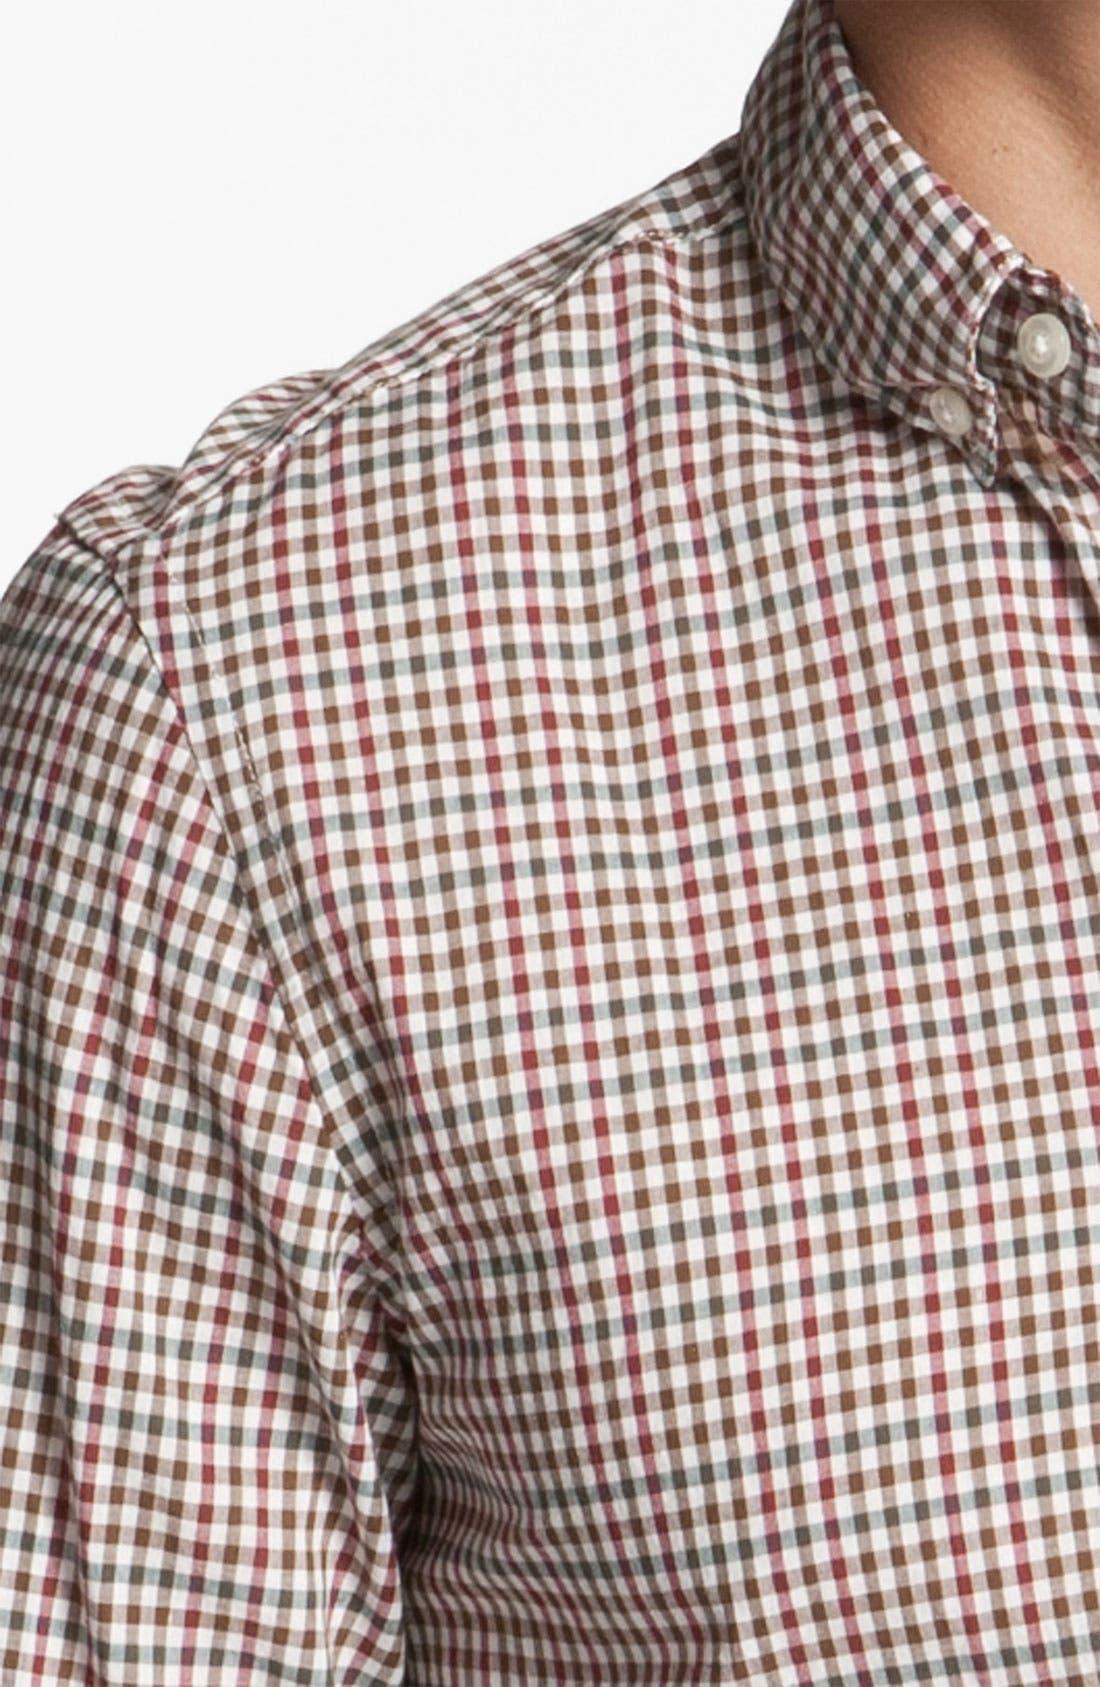 Alternate Image 3  - Steven Alan Plaid Sport Shirt